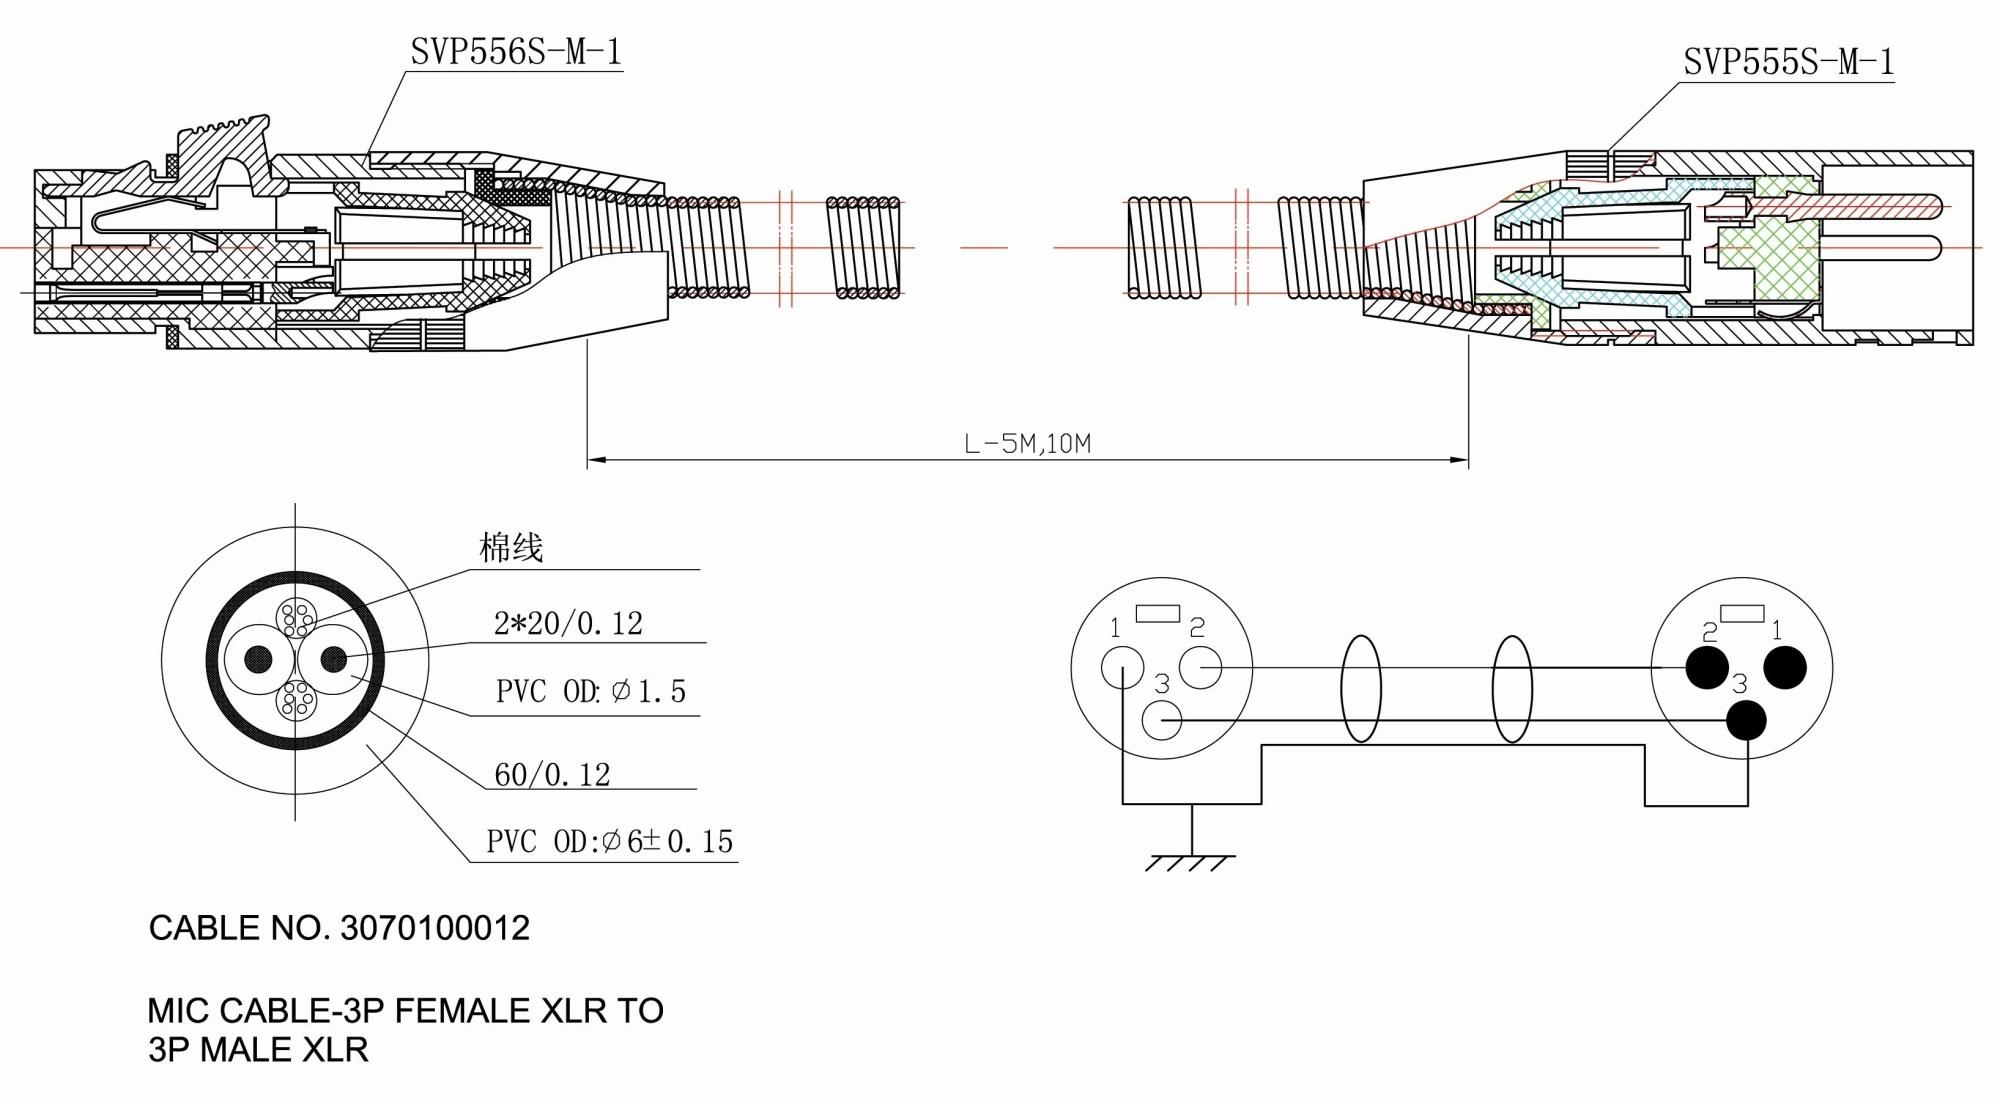 hight resolution of cat 6 wiring diagram rj45 free wiring diagramcat 6 wiring diagram rj45 rj45 wiring diagram australia